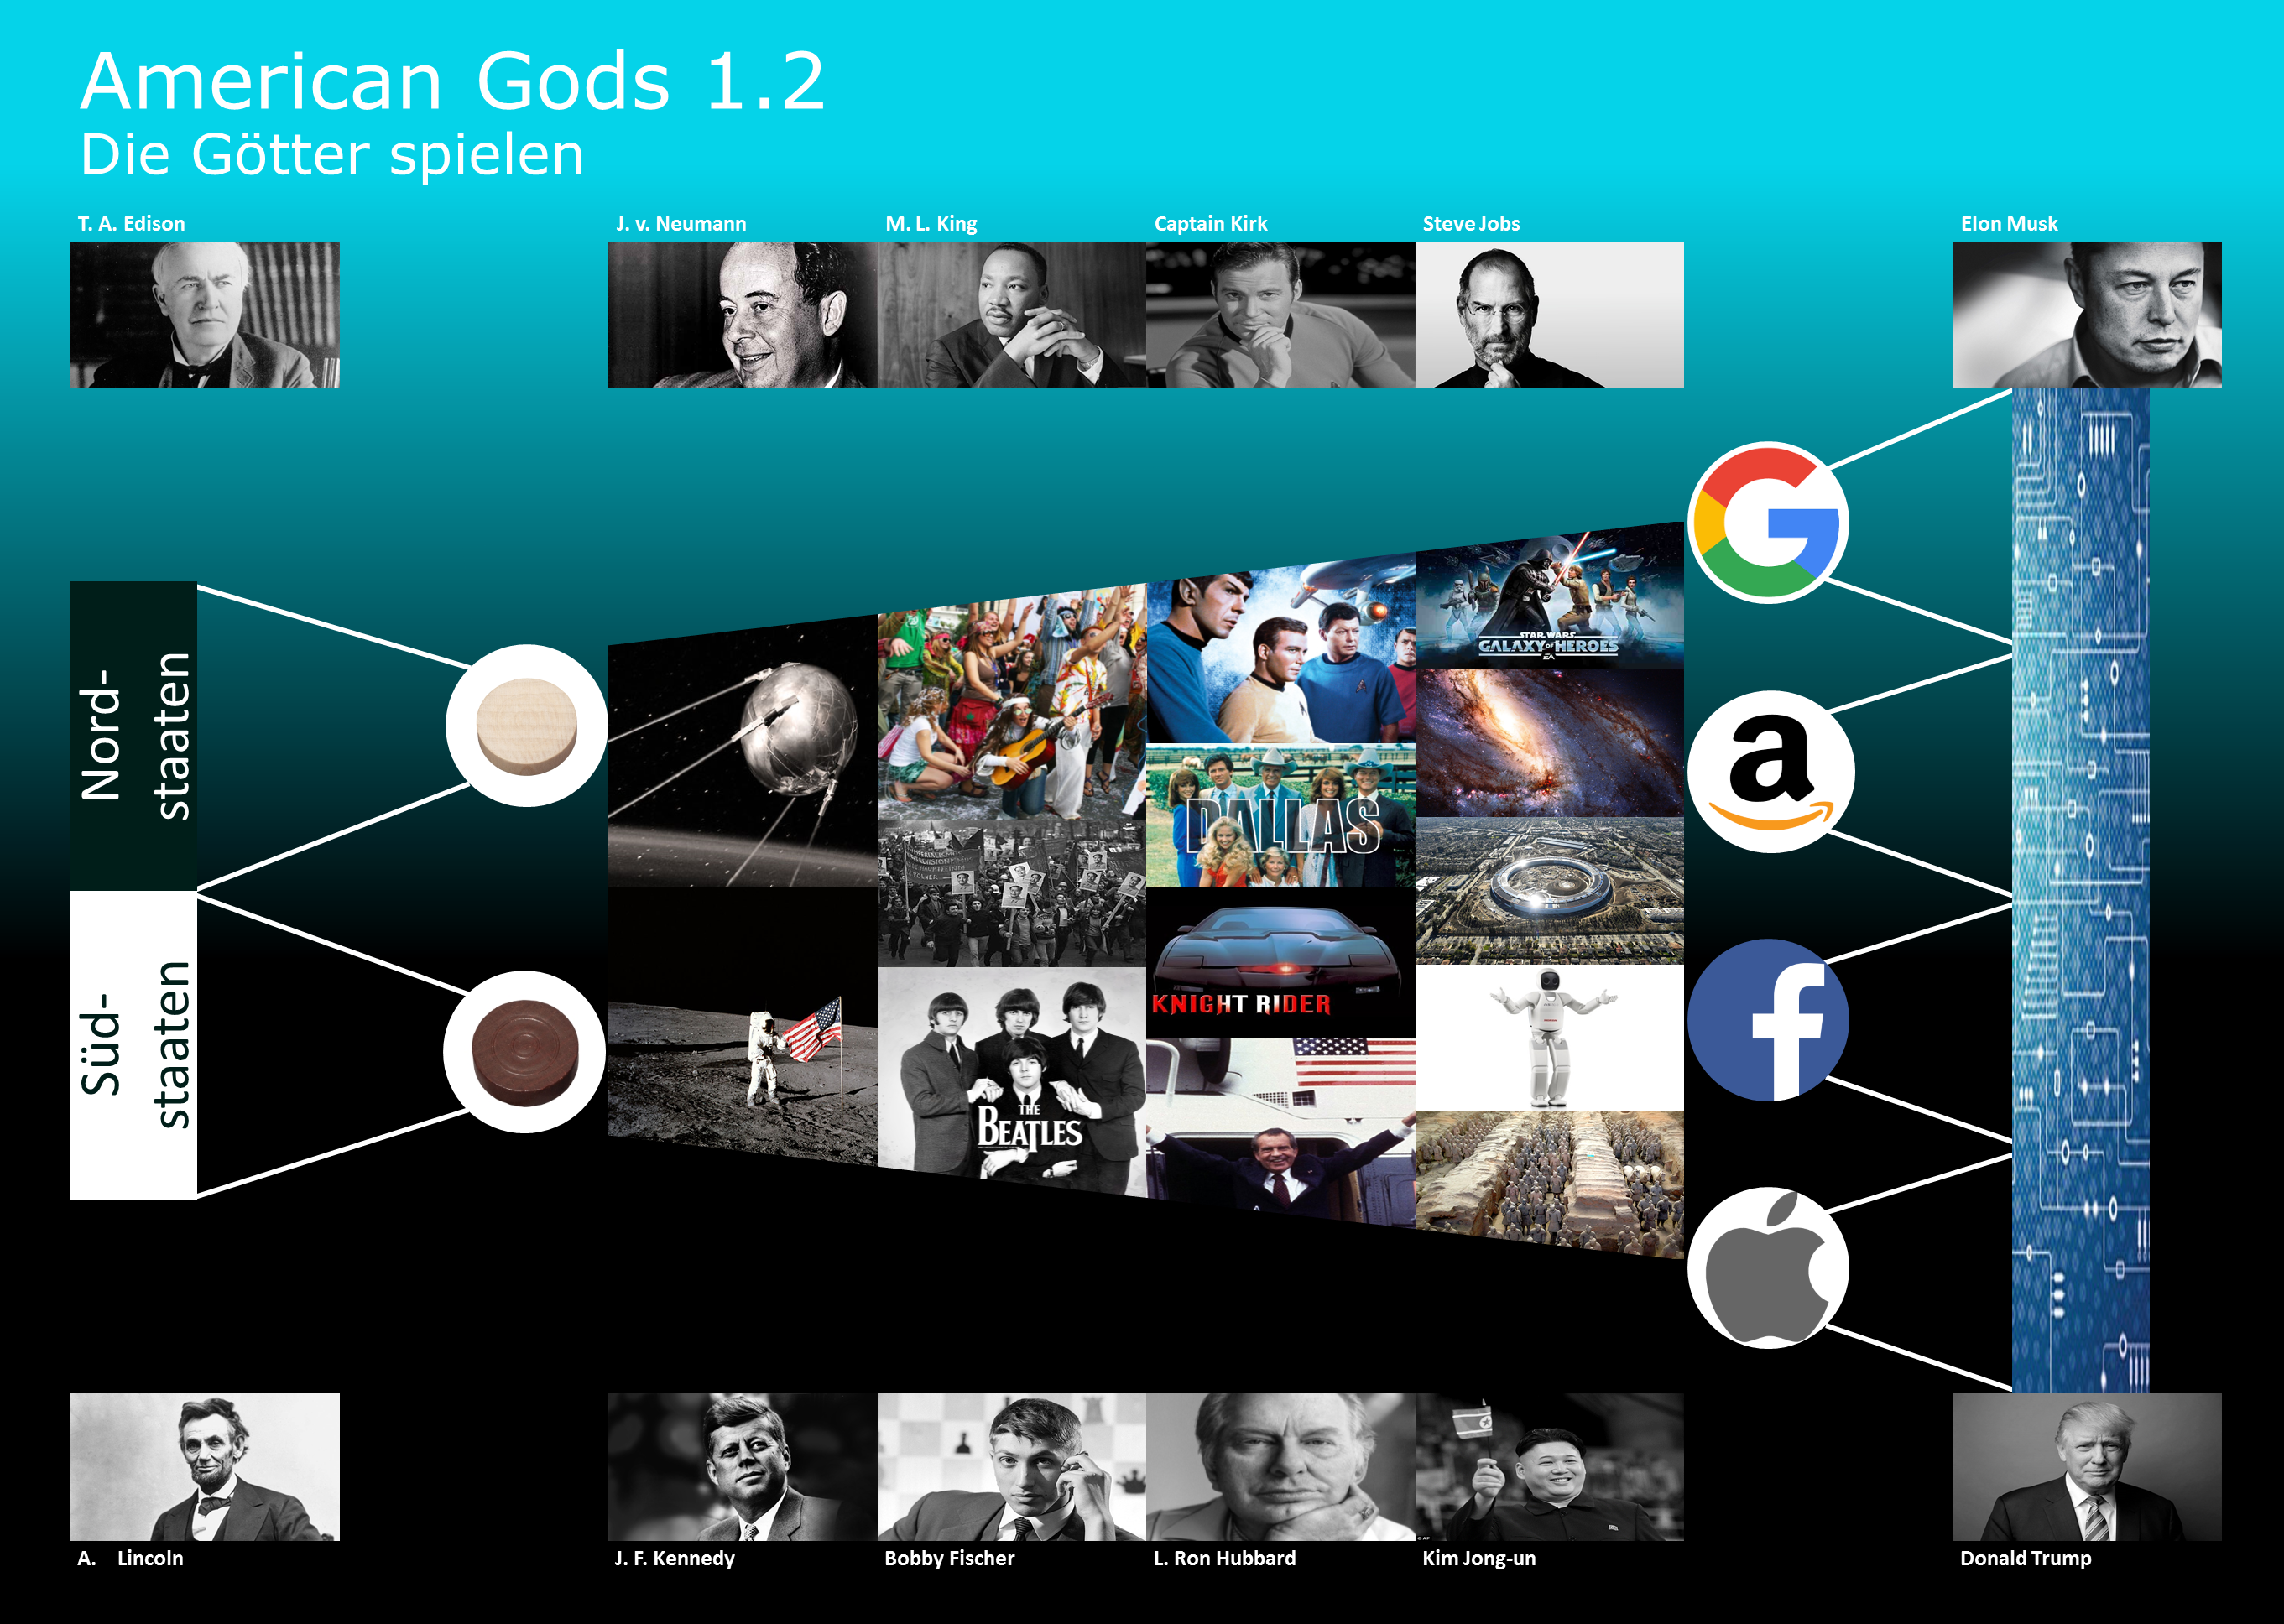 American Gods 1.2